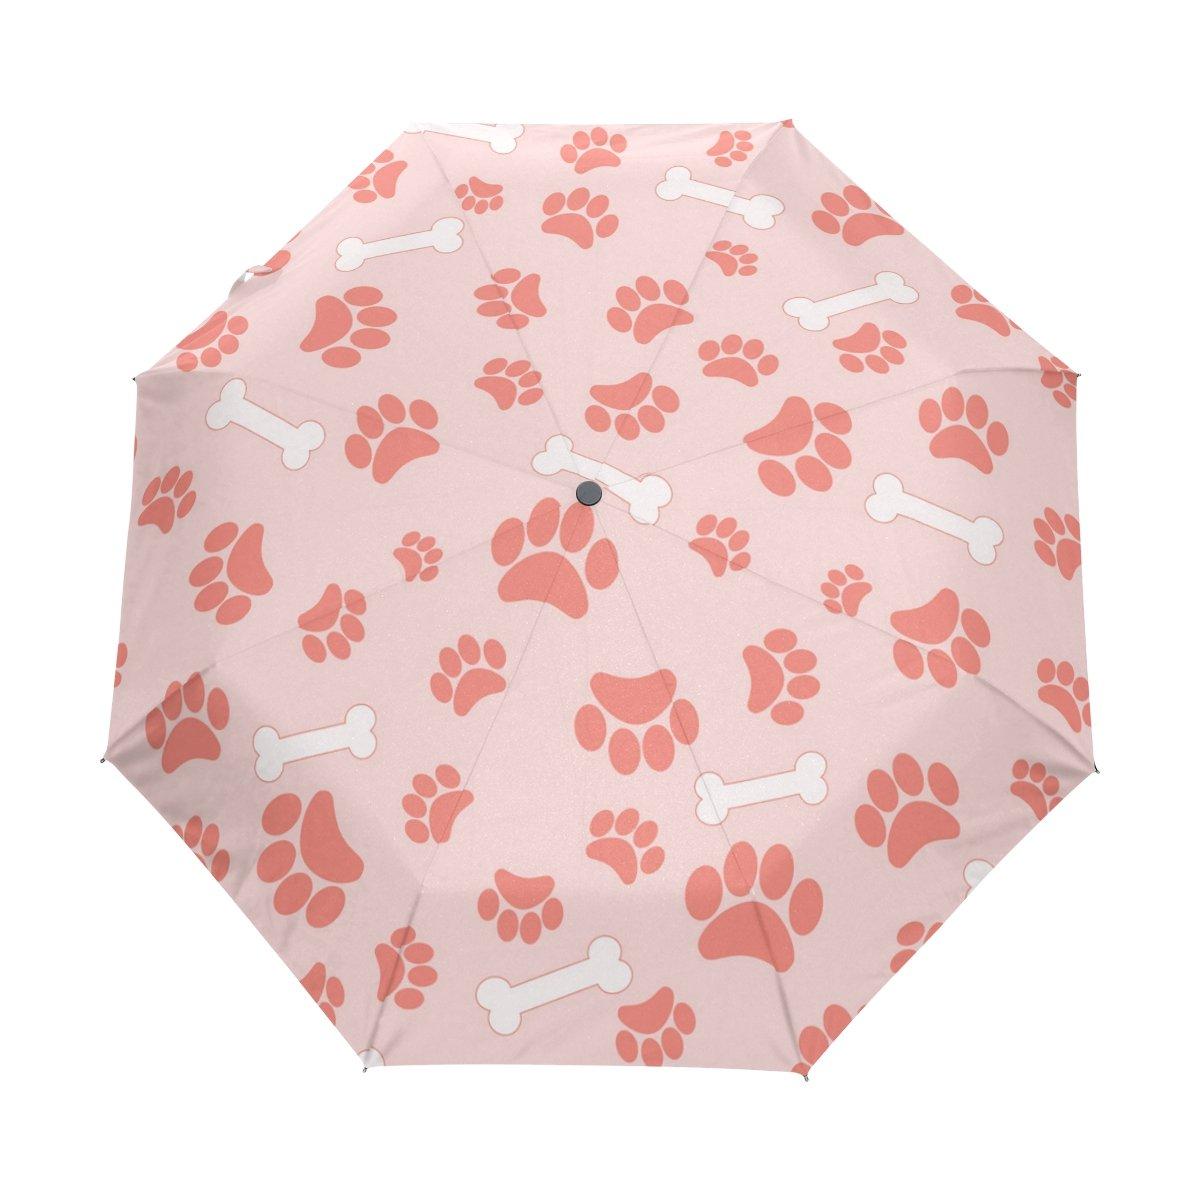 lavovo Cats Dogs Paw Footprintsとボーンパターン傘両面キャノピー自動開く閉じる折りたたみ式旅行雨傘 B076G4QWC4